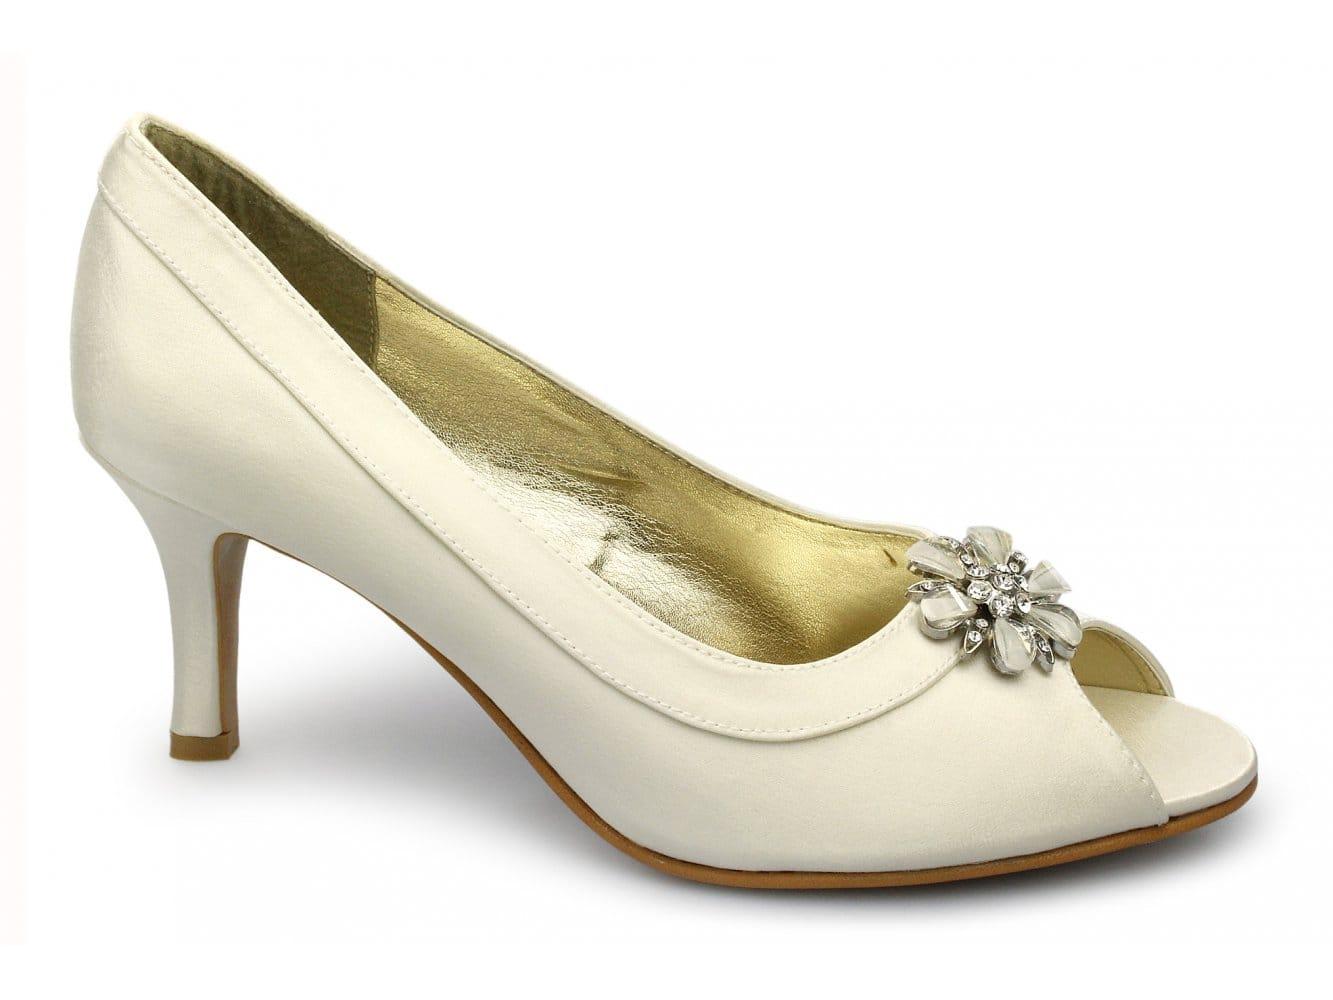 womens satin peep toe wide fit comfy stiletto heels